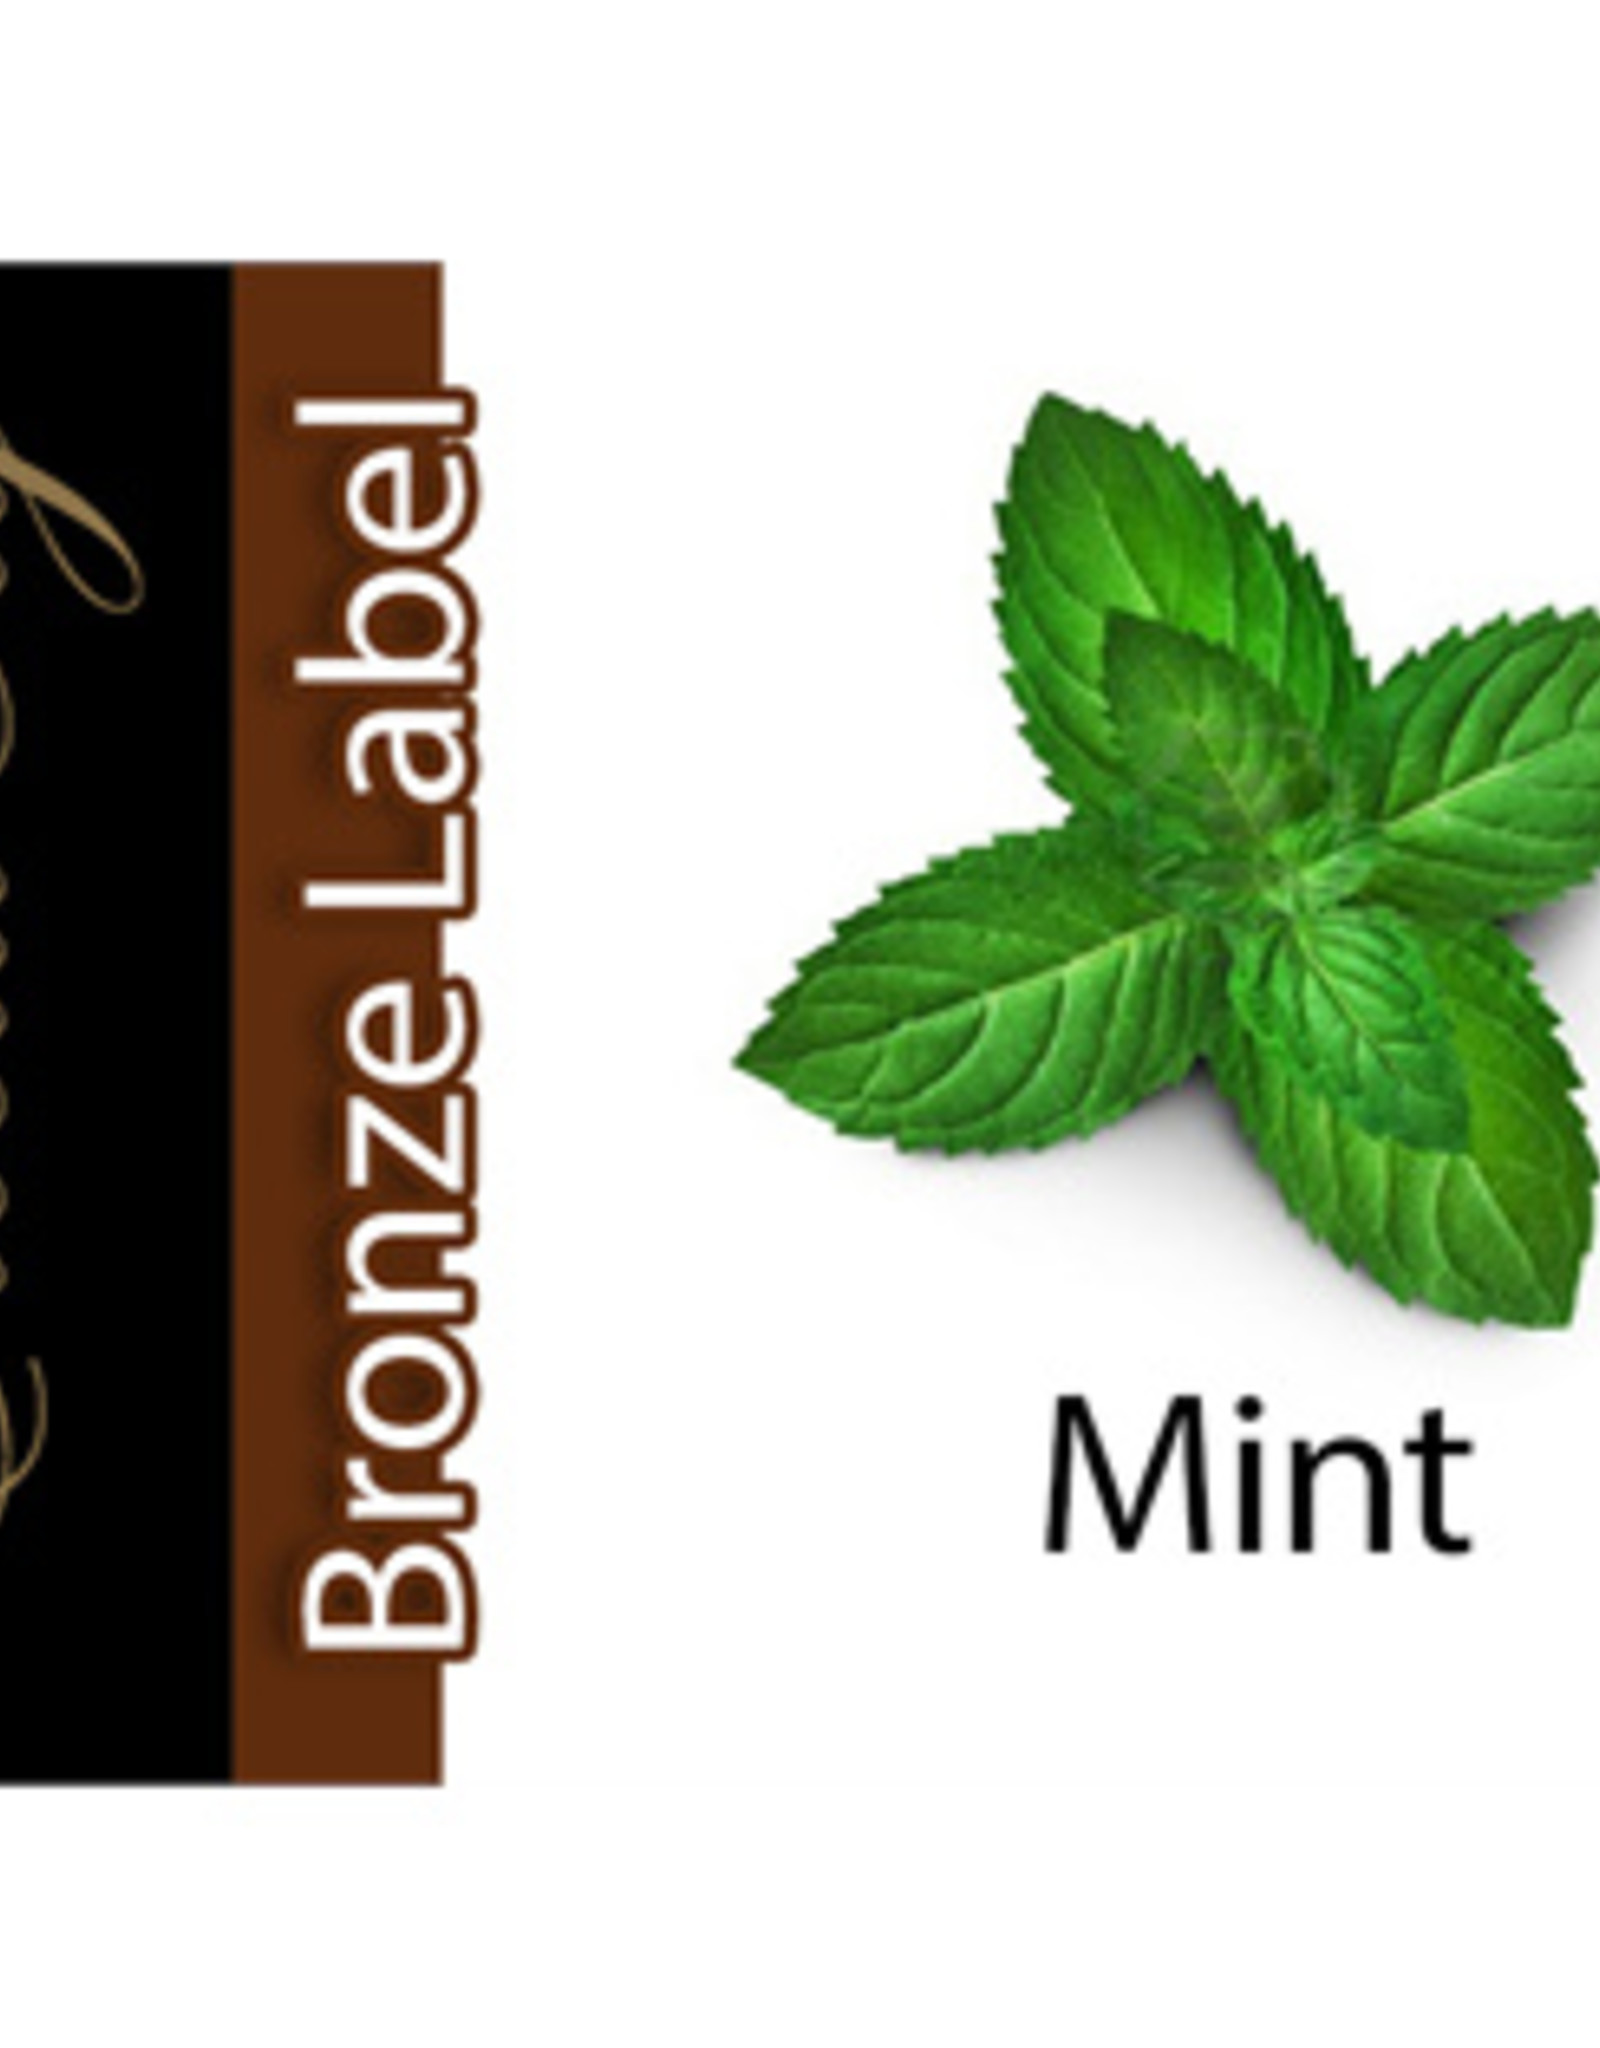 Exclucig Exclucig Bronze Label E-liquid Mint 12 mg Nicotine